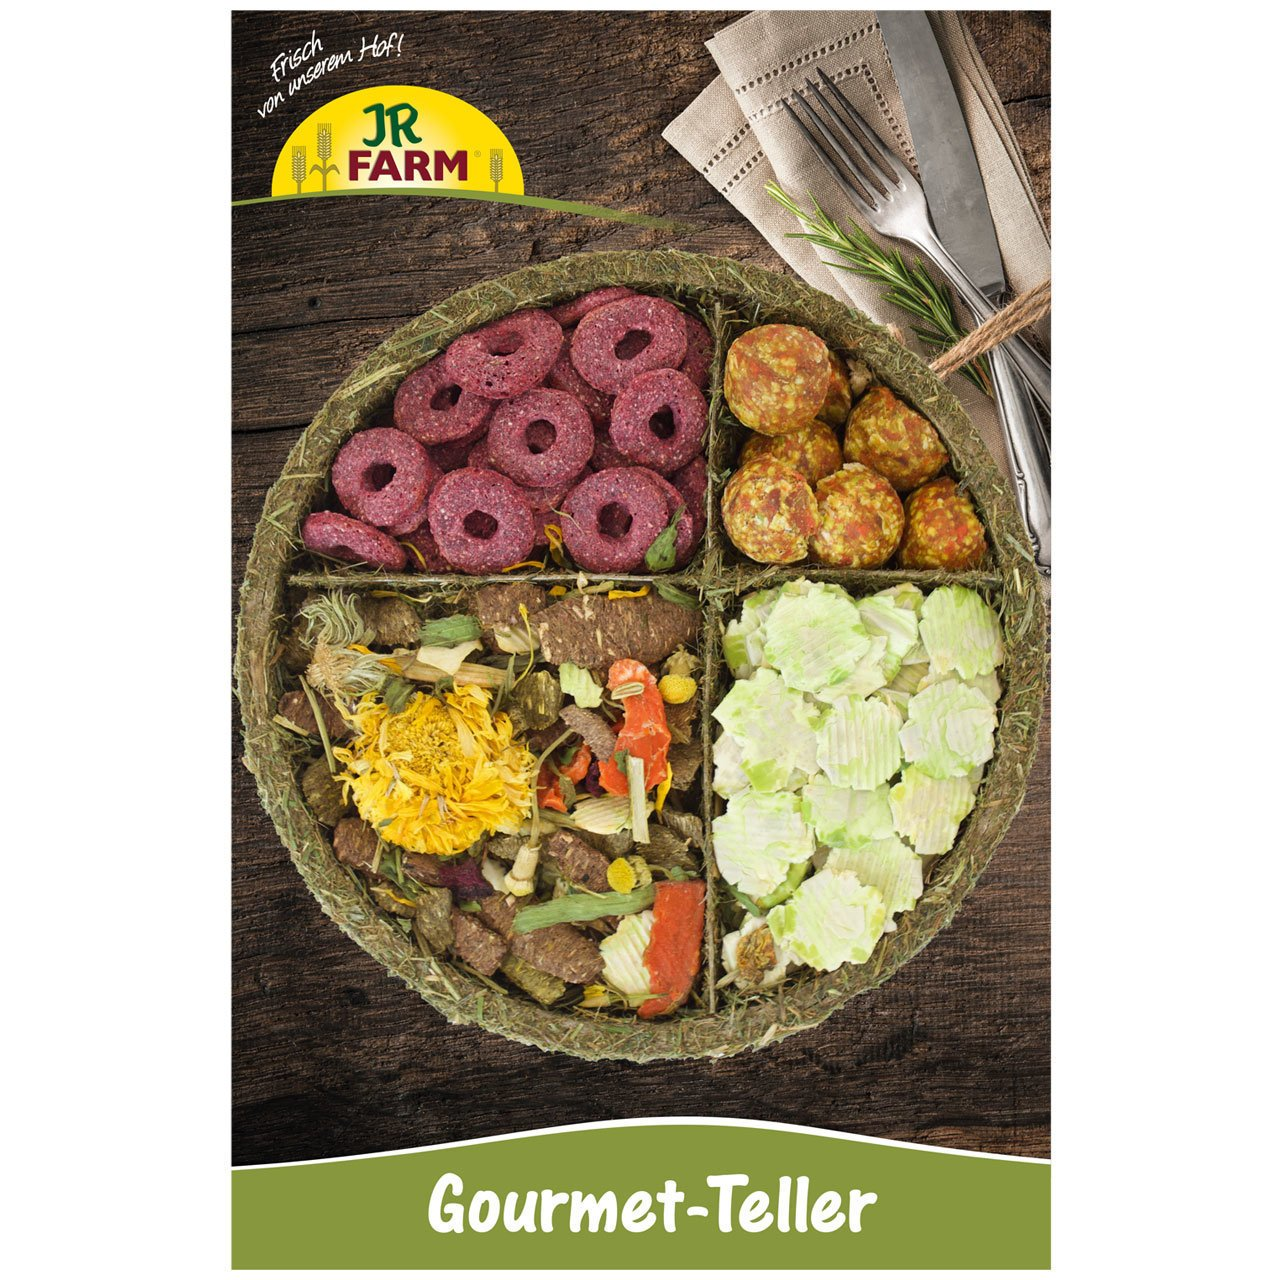 JR Farm Kleintier Snack Teller Preview Image